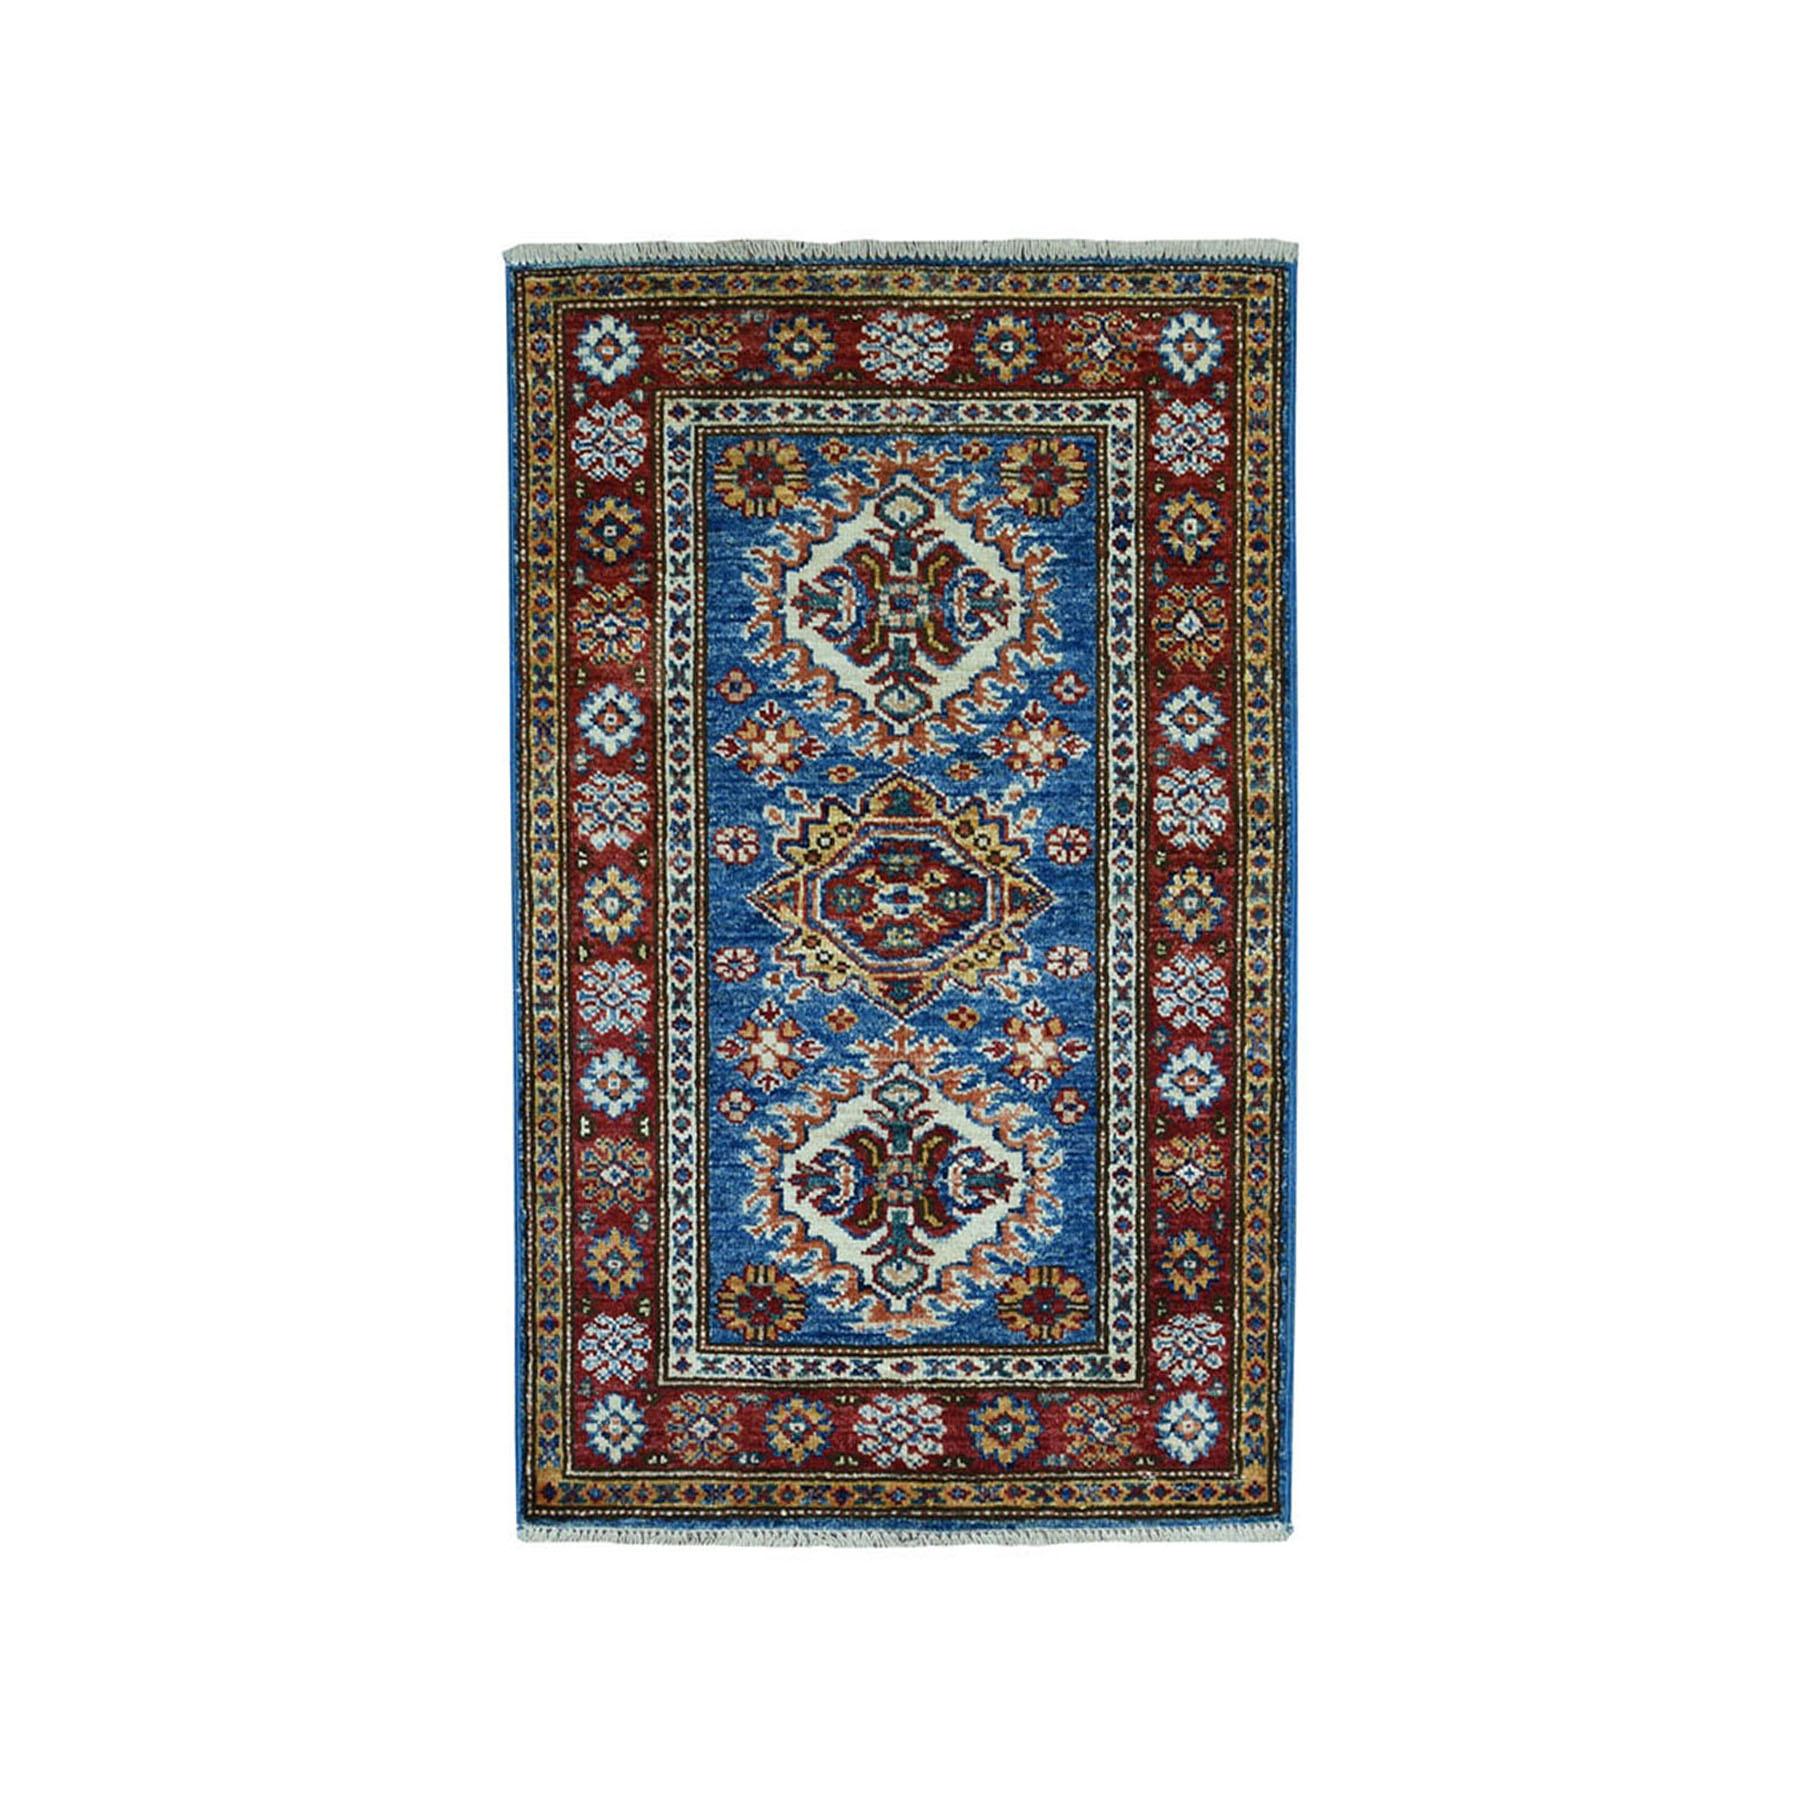 "2'X3'2"" Blue Super Kazak Pure Wool Geometric Design Hand-Knotted Oriental Rug moae0909"